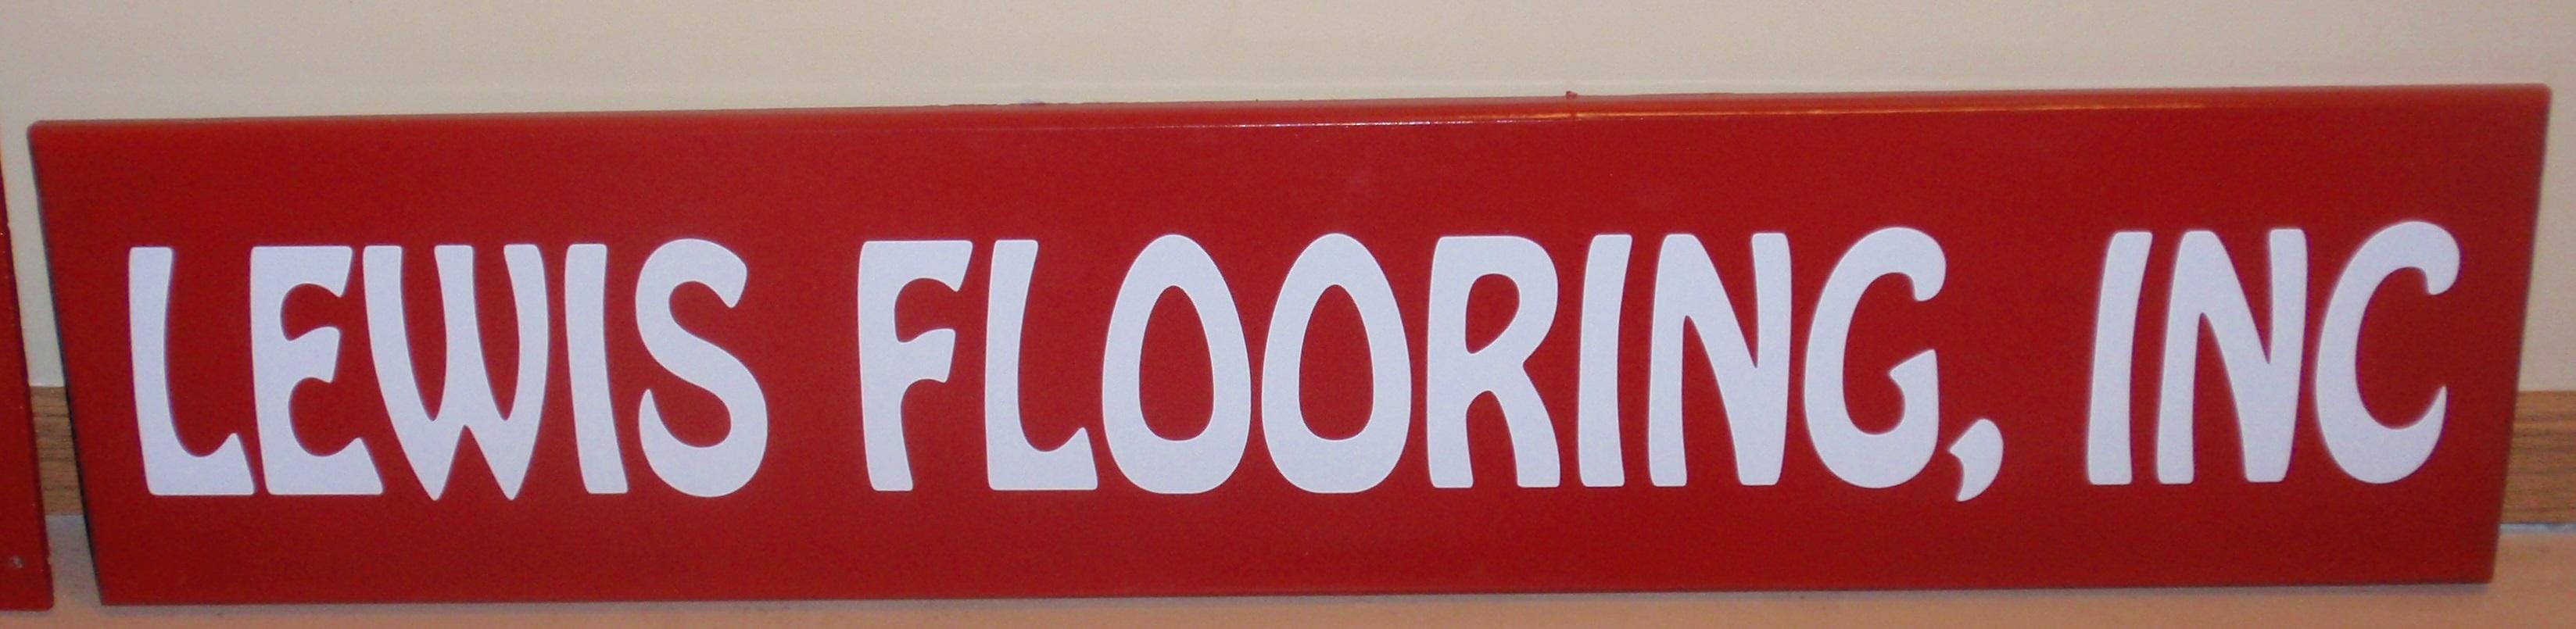 Lewis Flooring